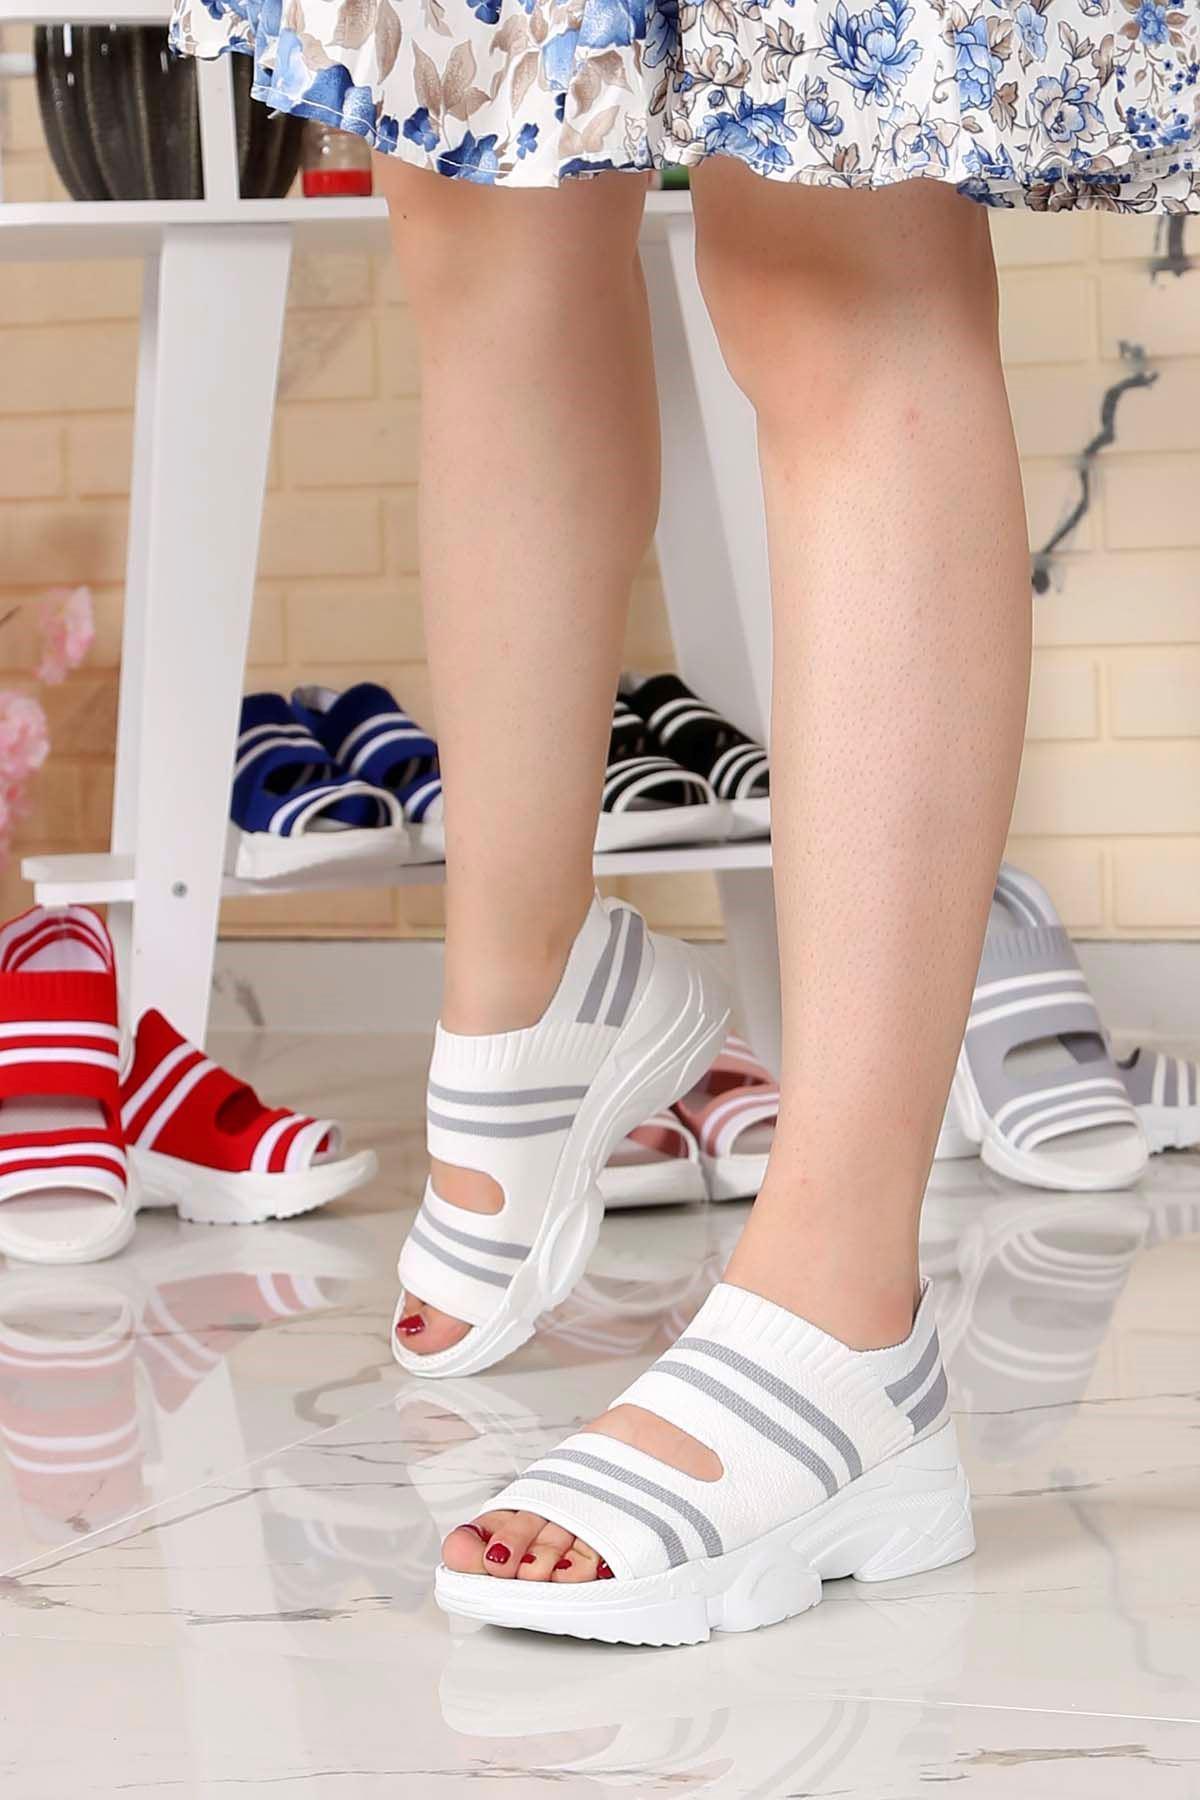 Brk-101 Triko Sandalet Beyaz